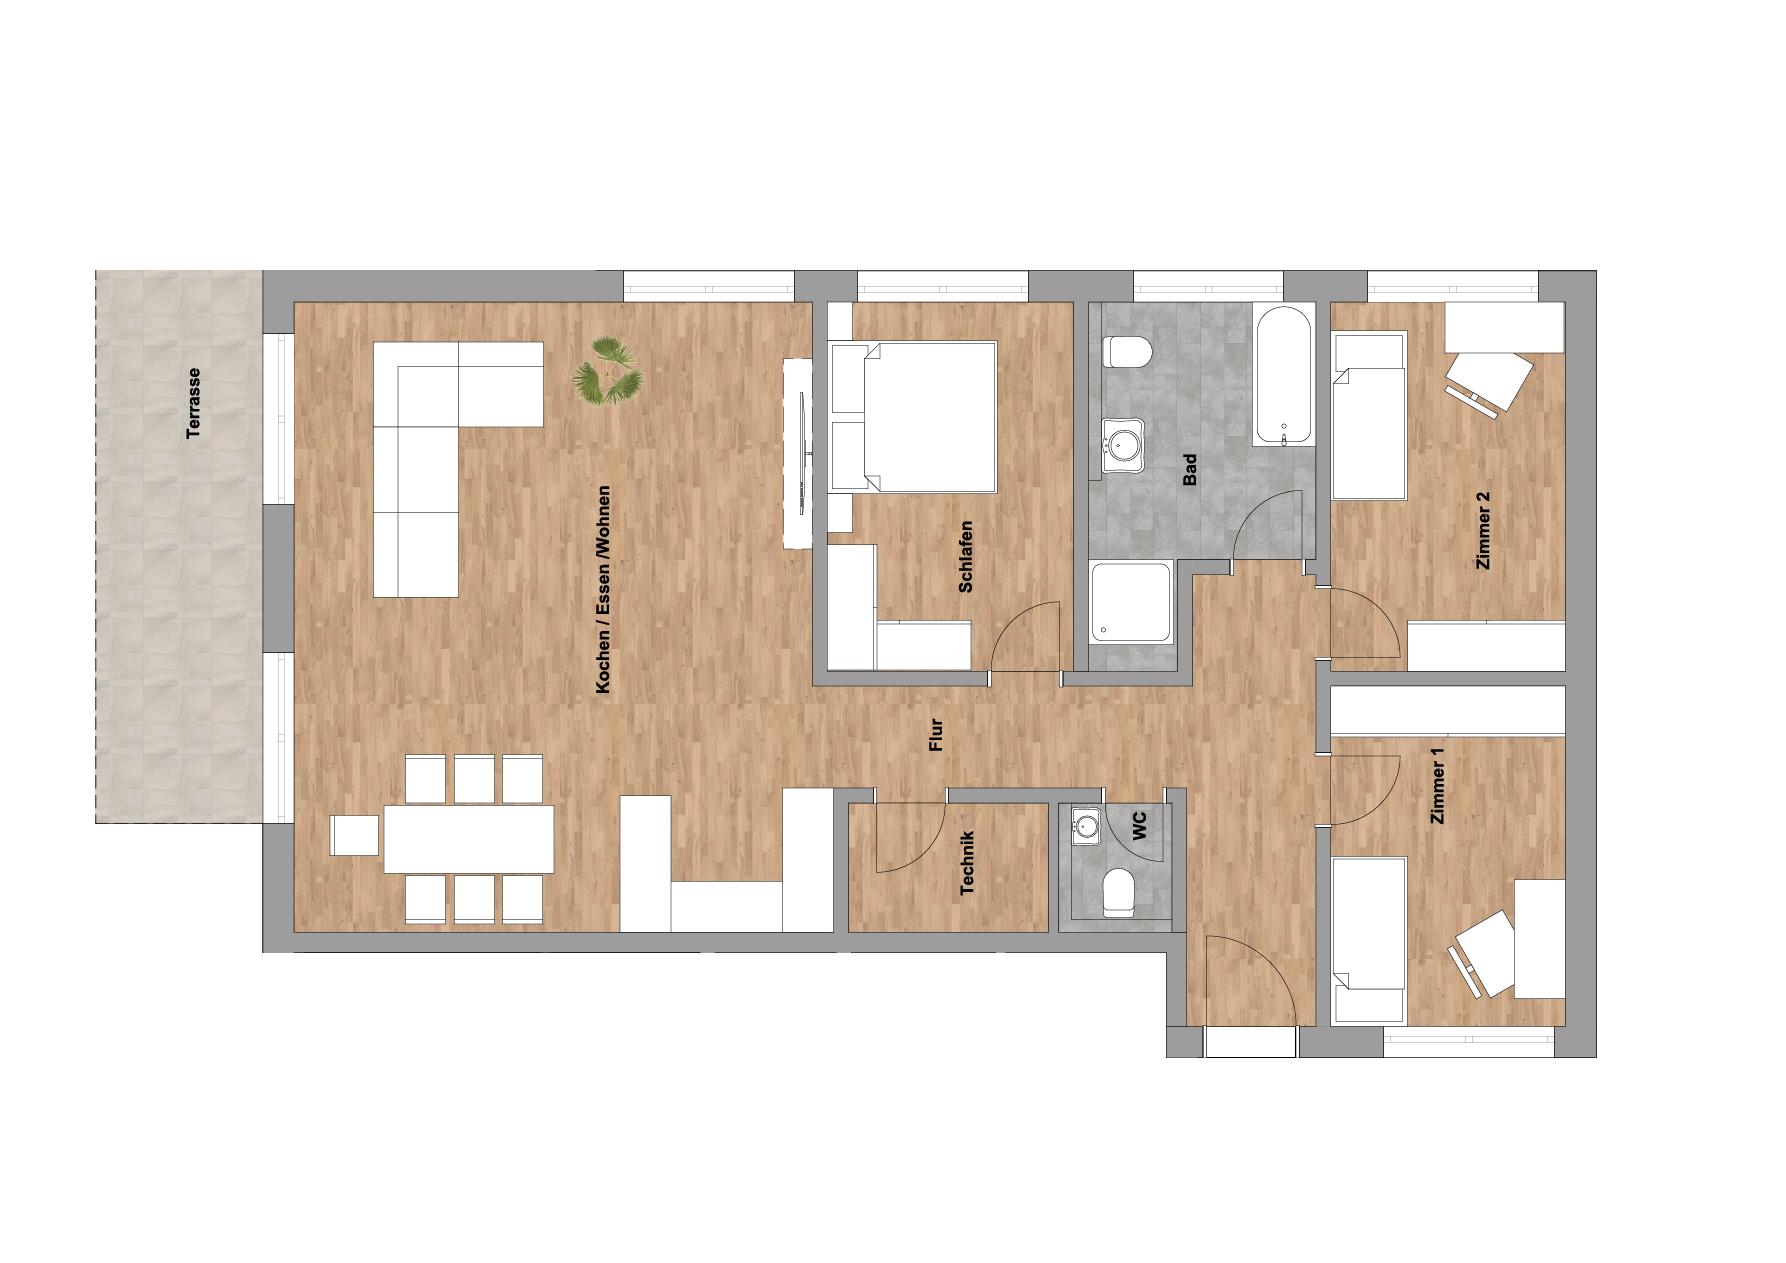 infoScout Neubau Projekt Ittersbach Wohnung 4